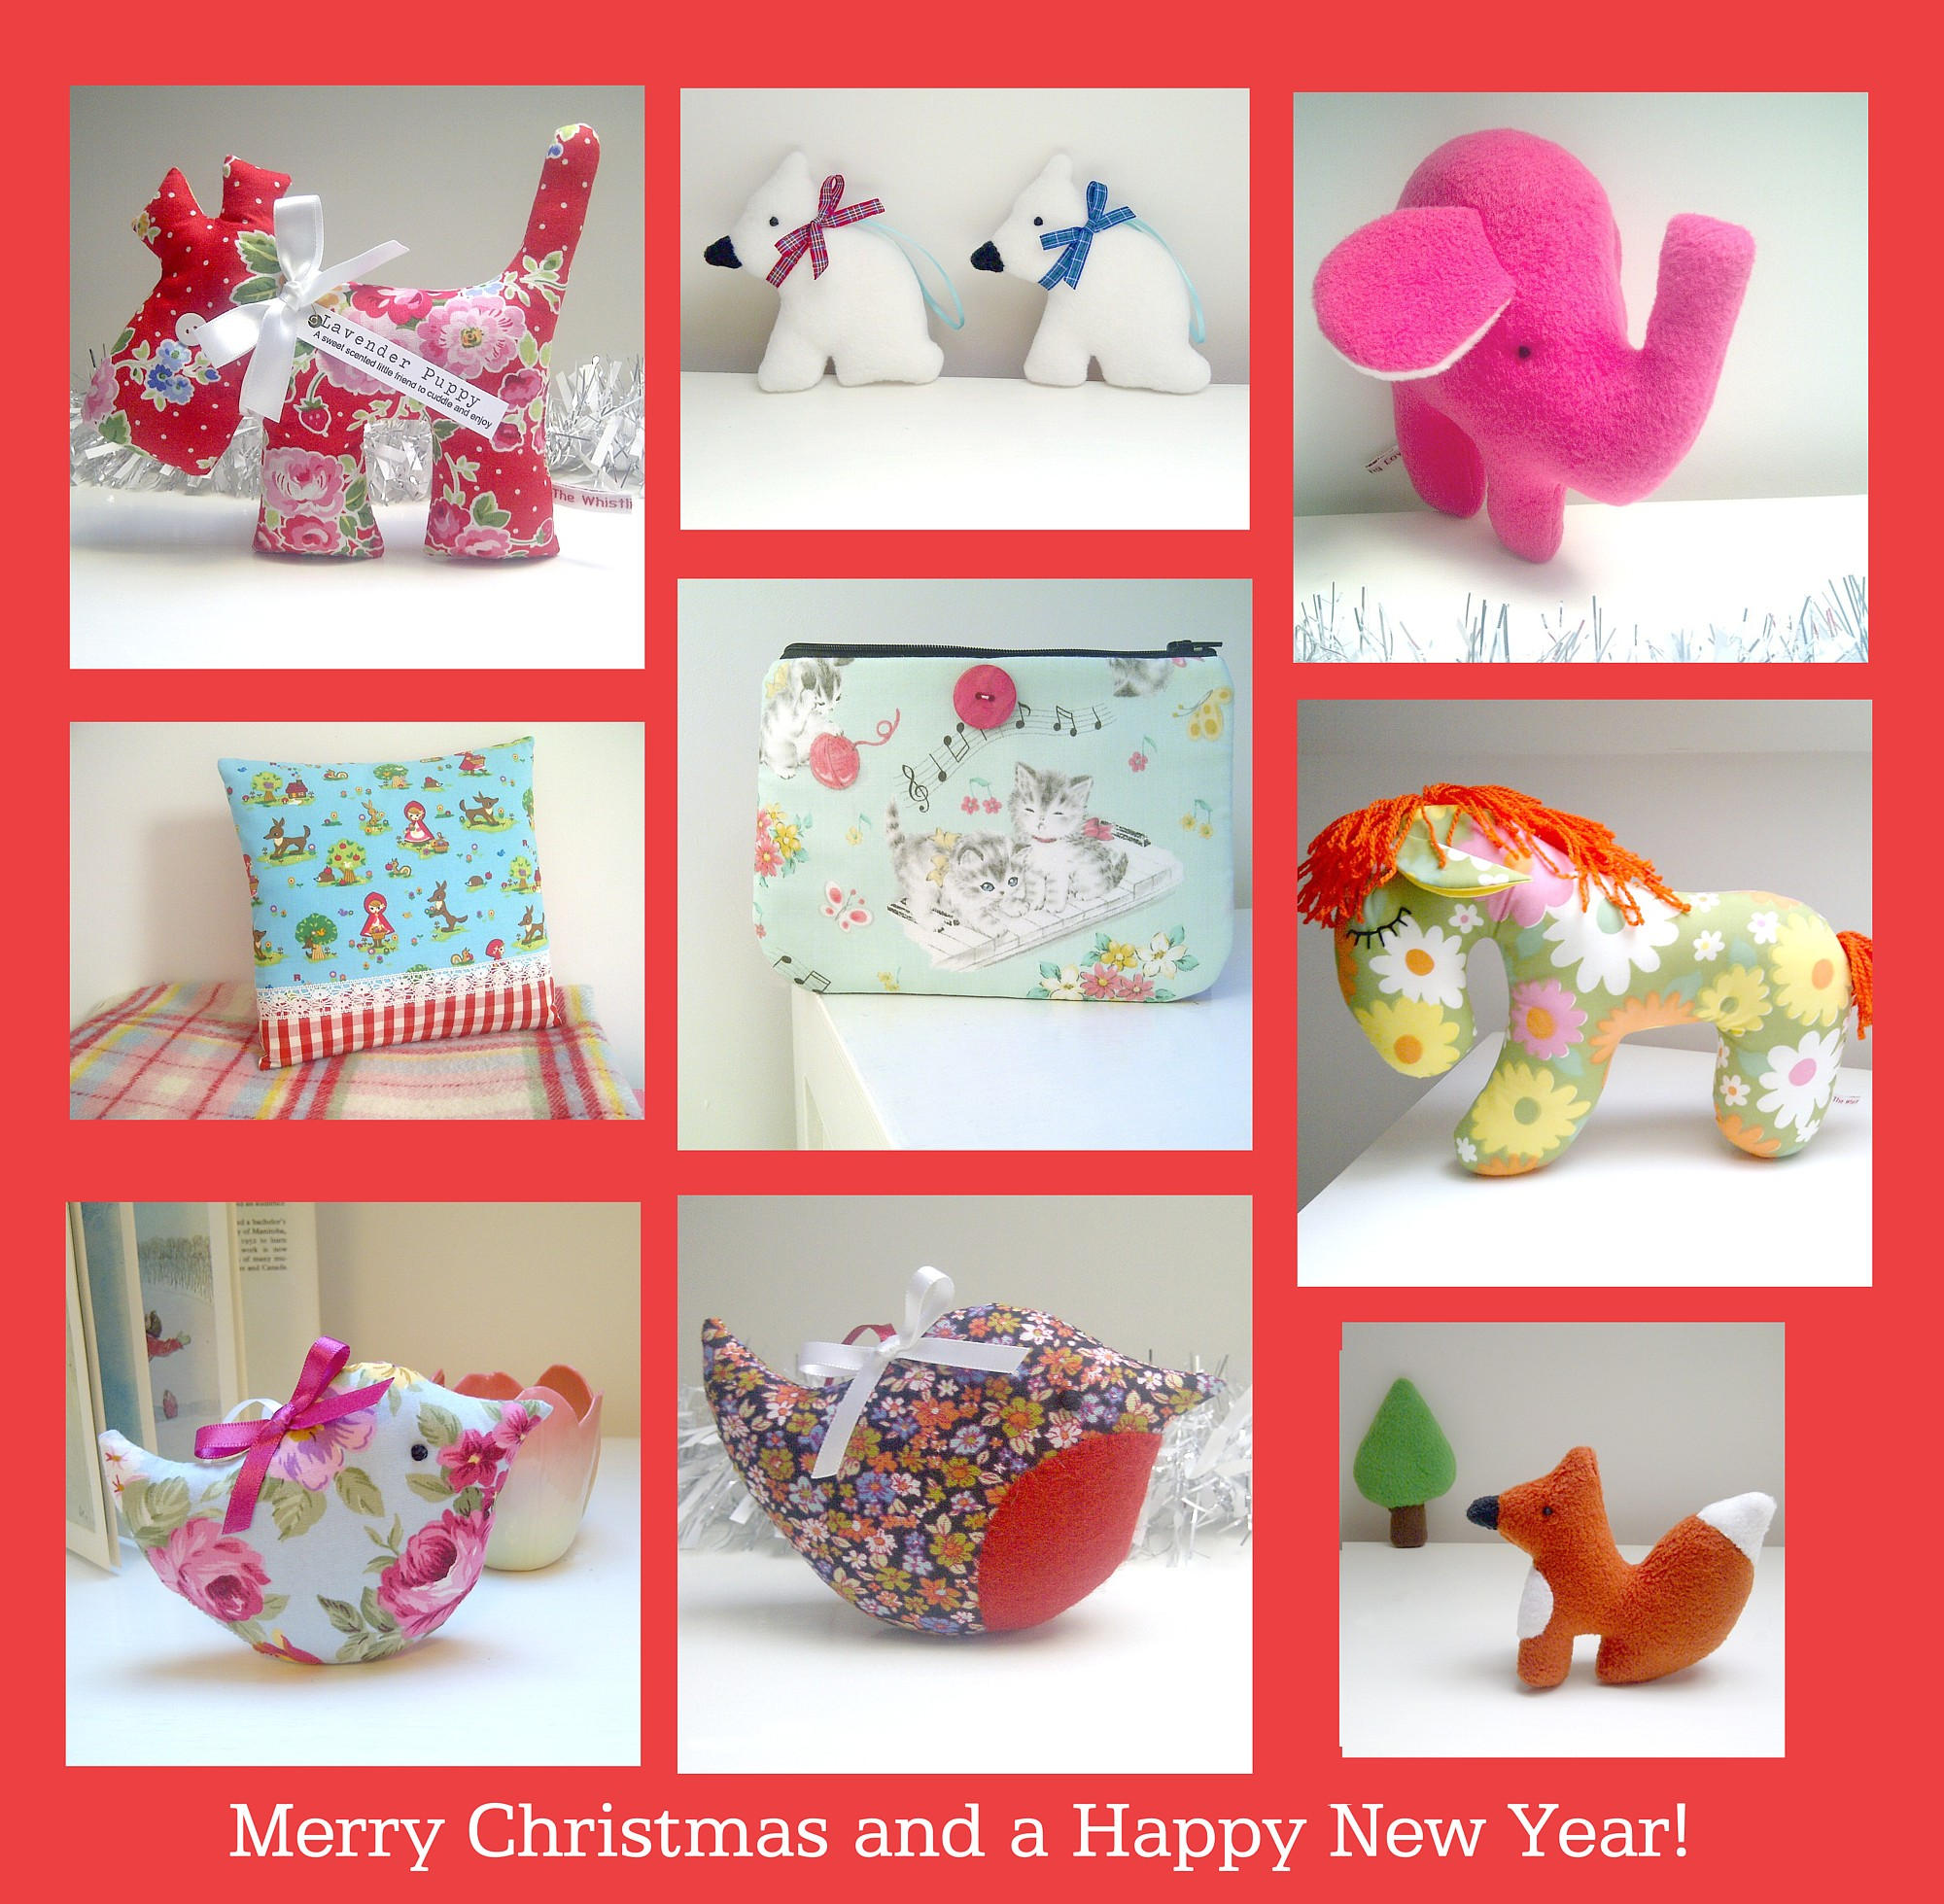 Christmas Festive Makes